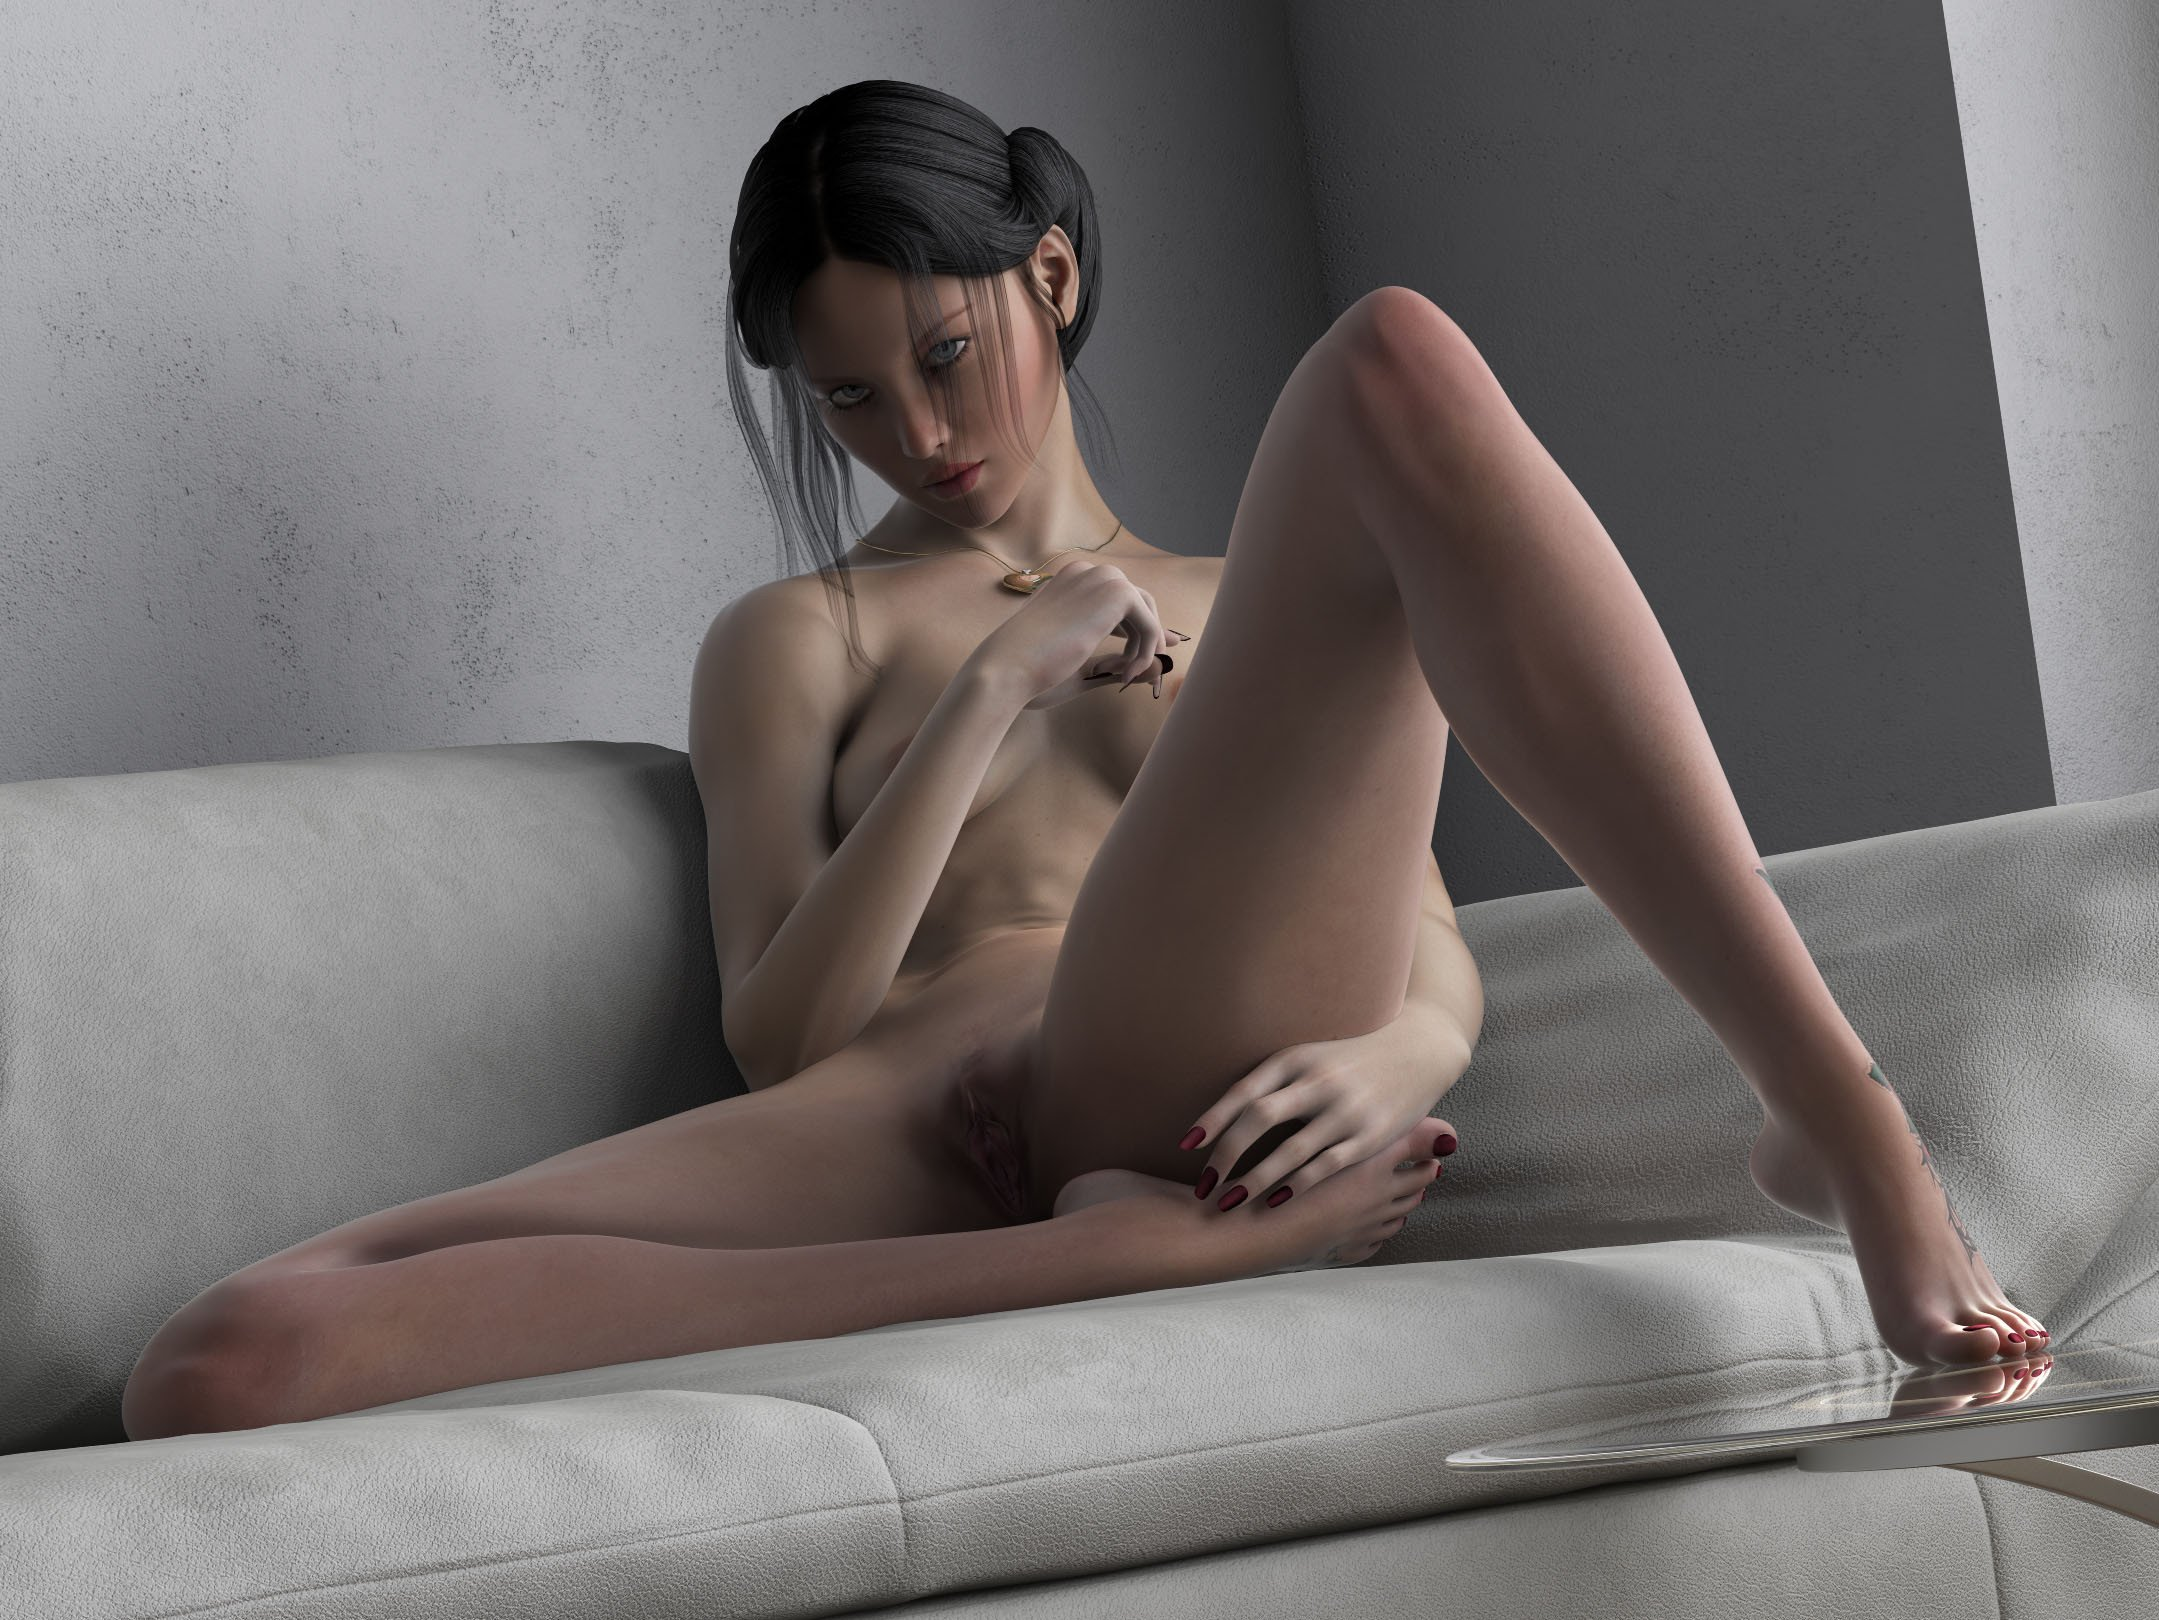 Porn 3d errotic -gay fucks scene